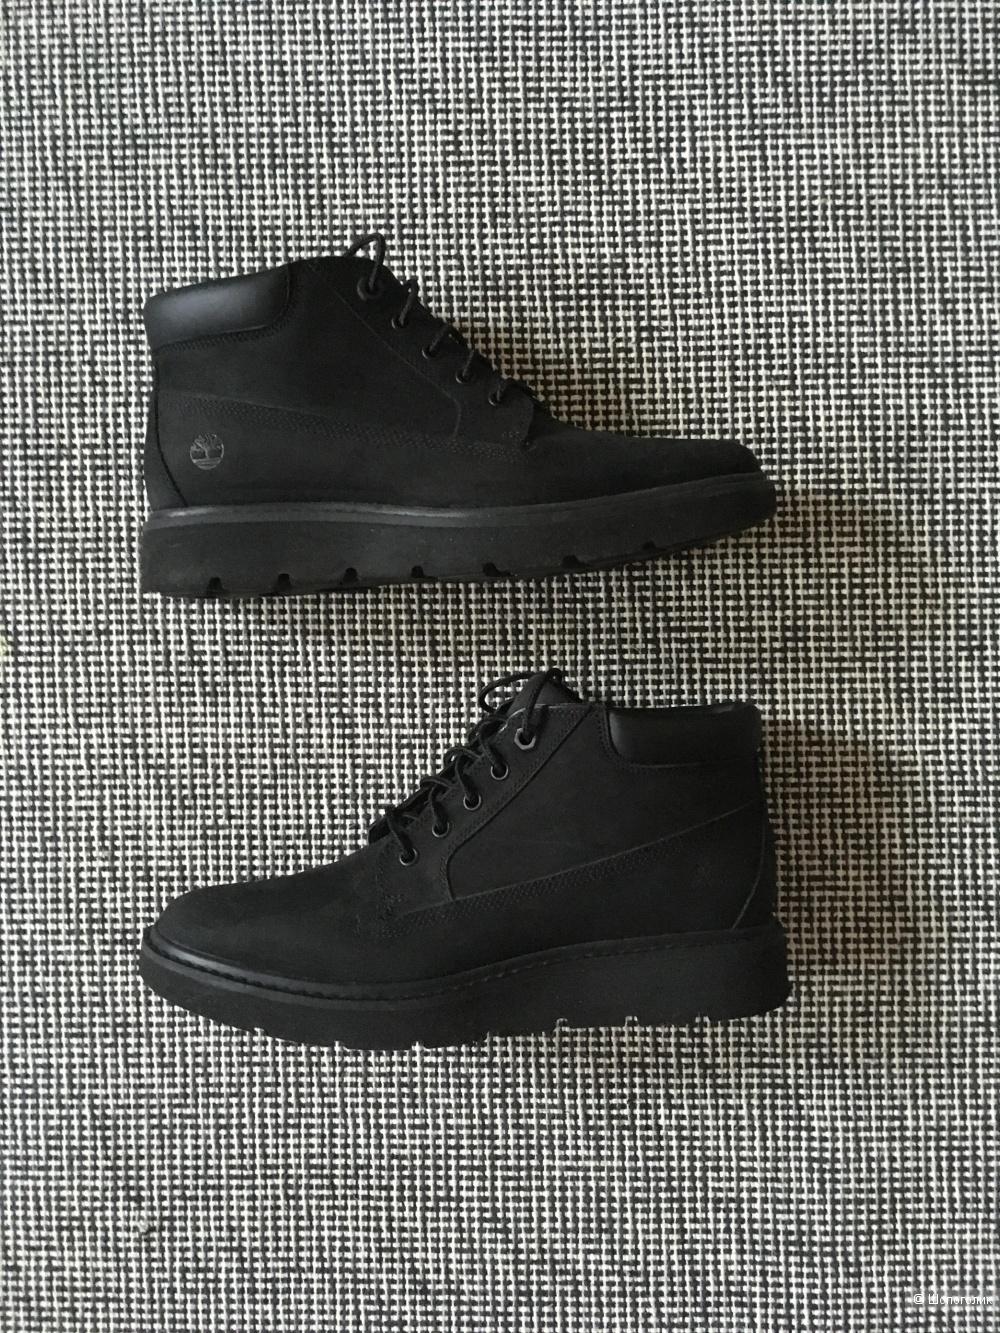 Ботинки Timberland EU39